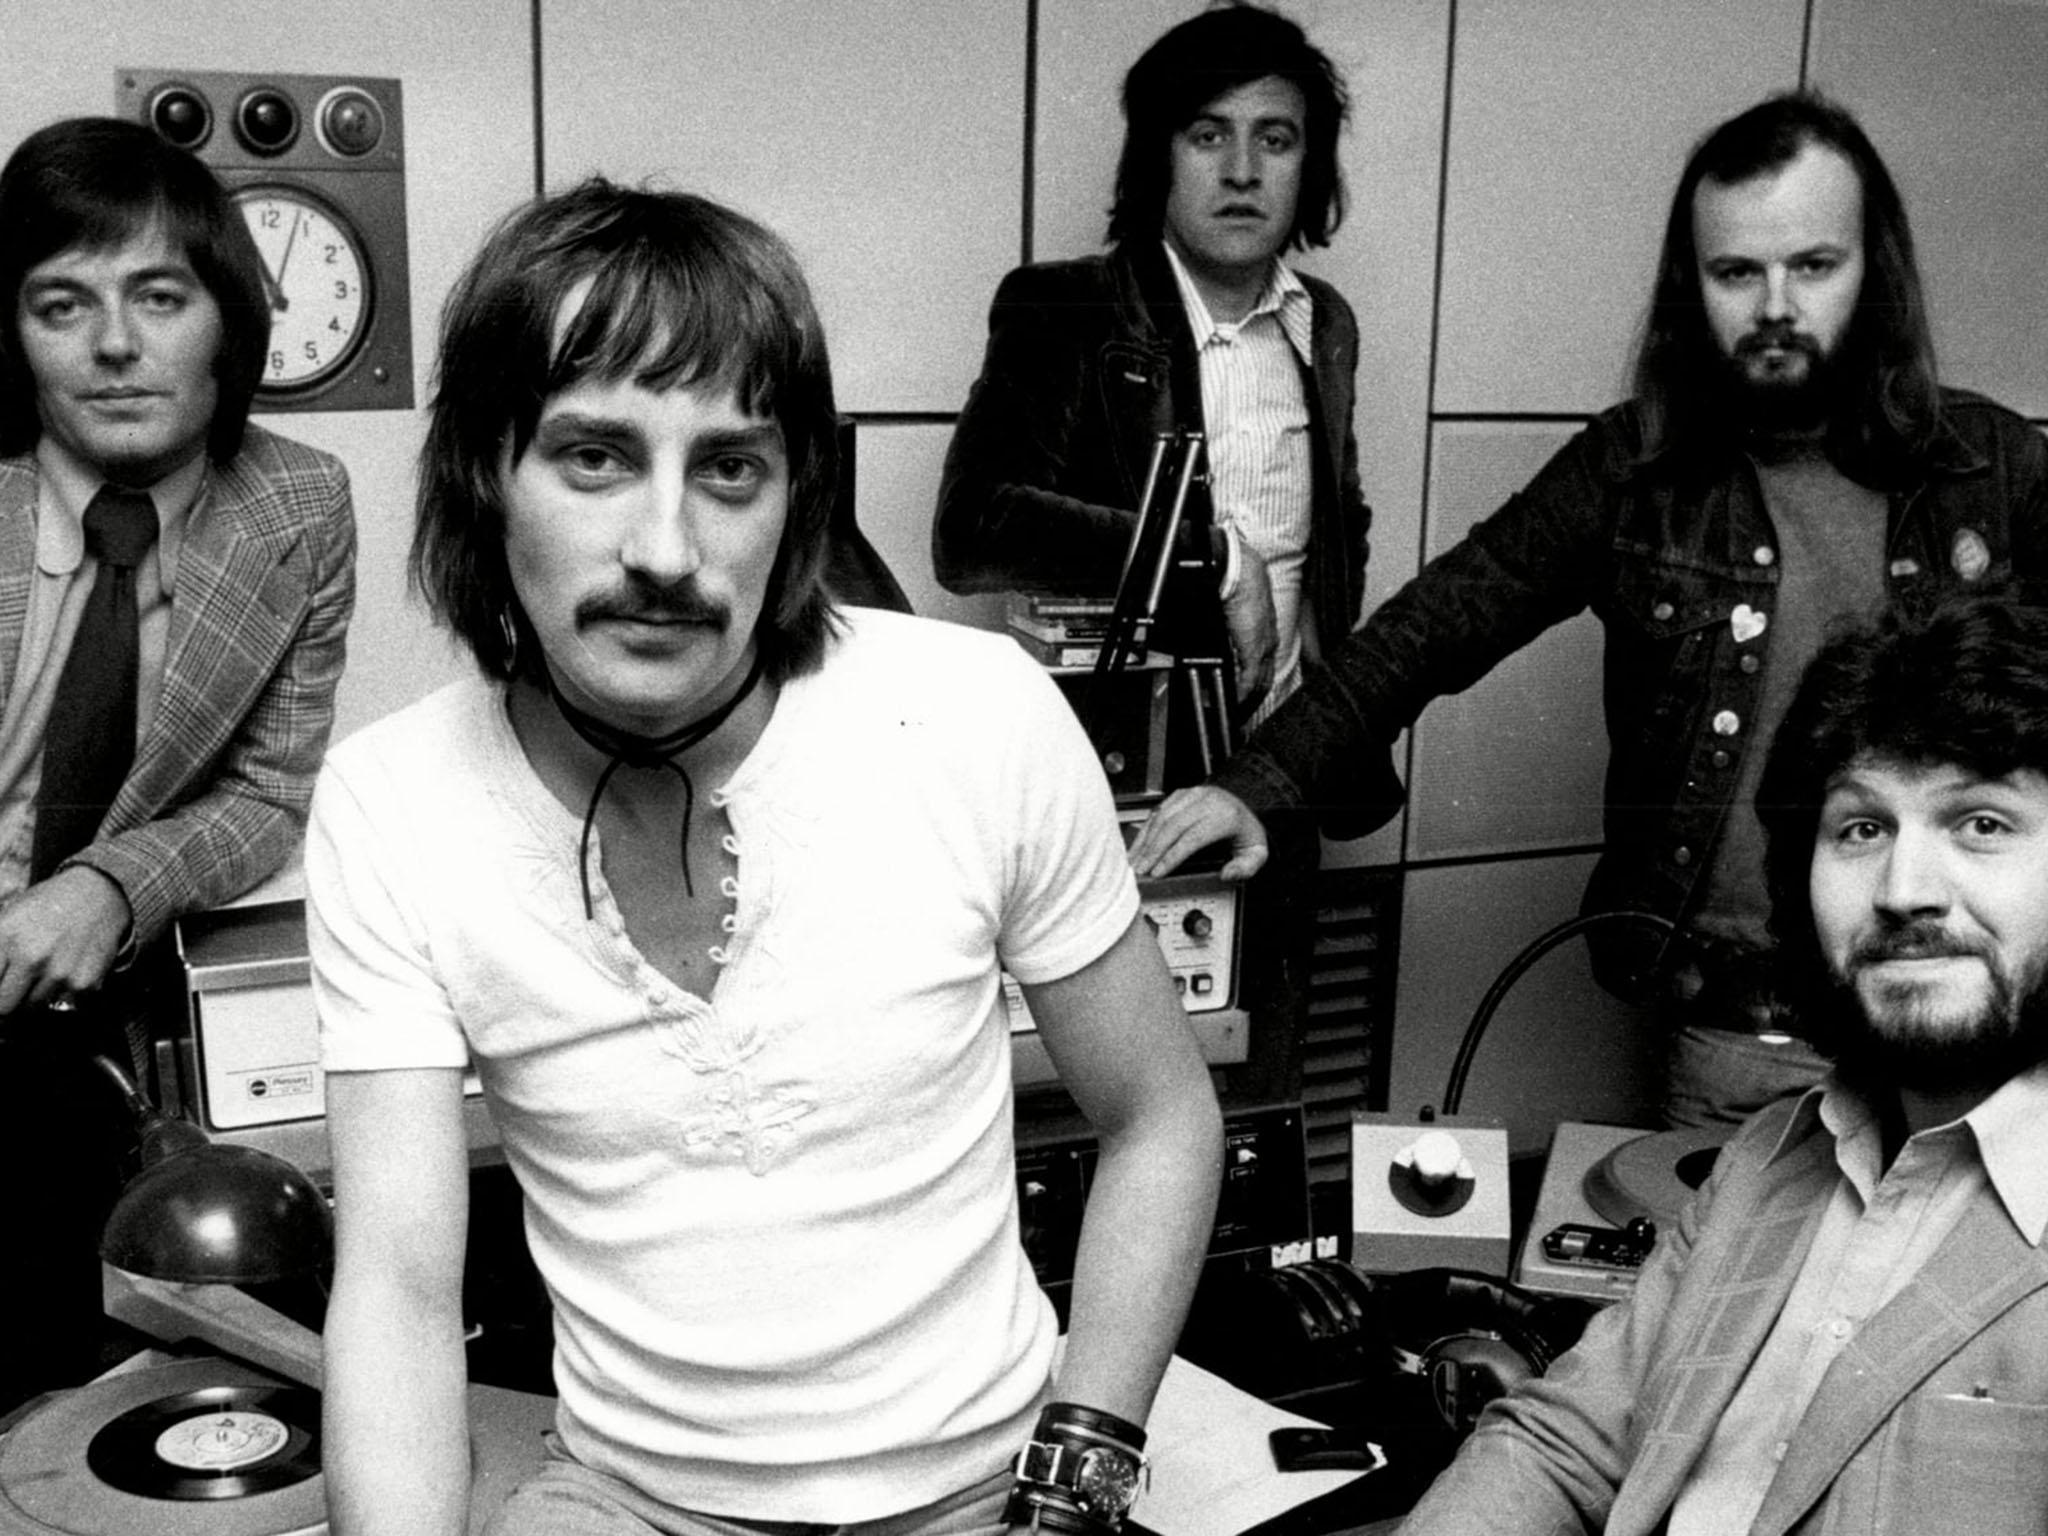 Radio 1 News: Radio 1's 50th Birthday: The Legends, Songs And Shocking